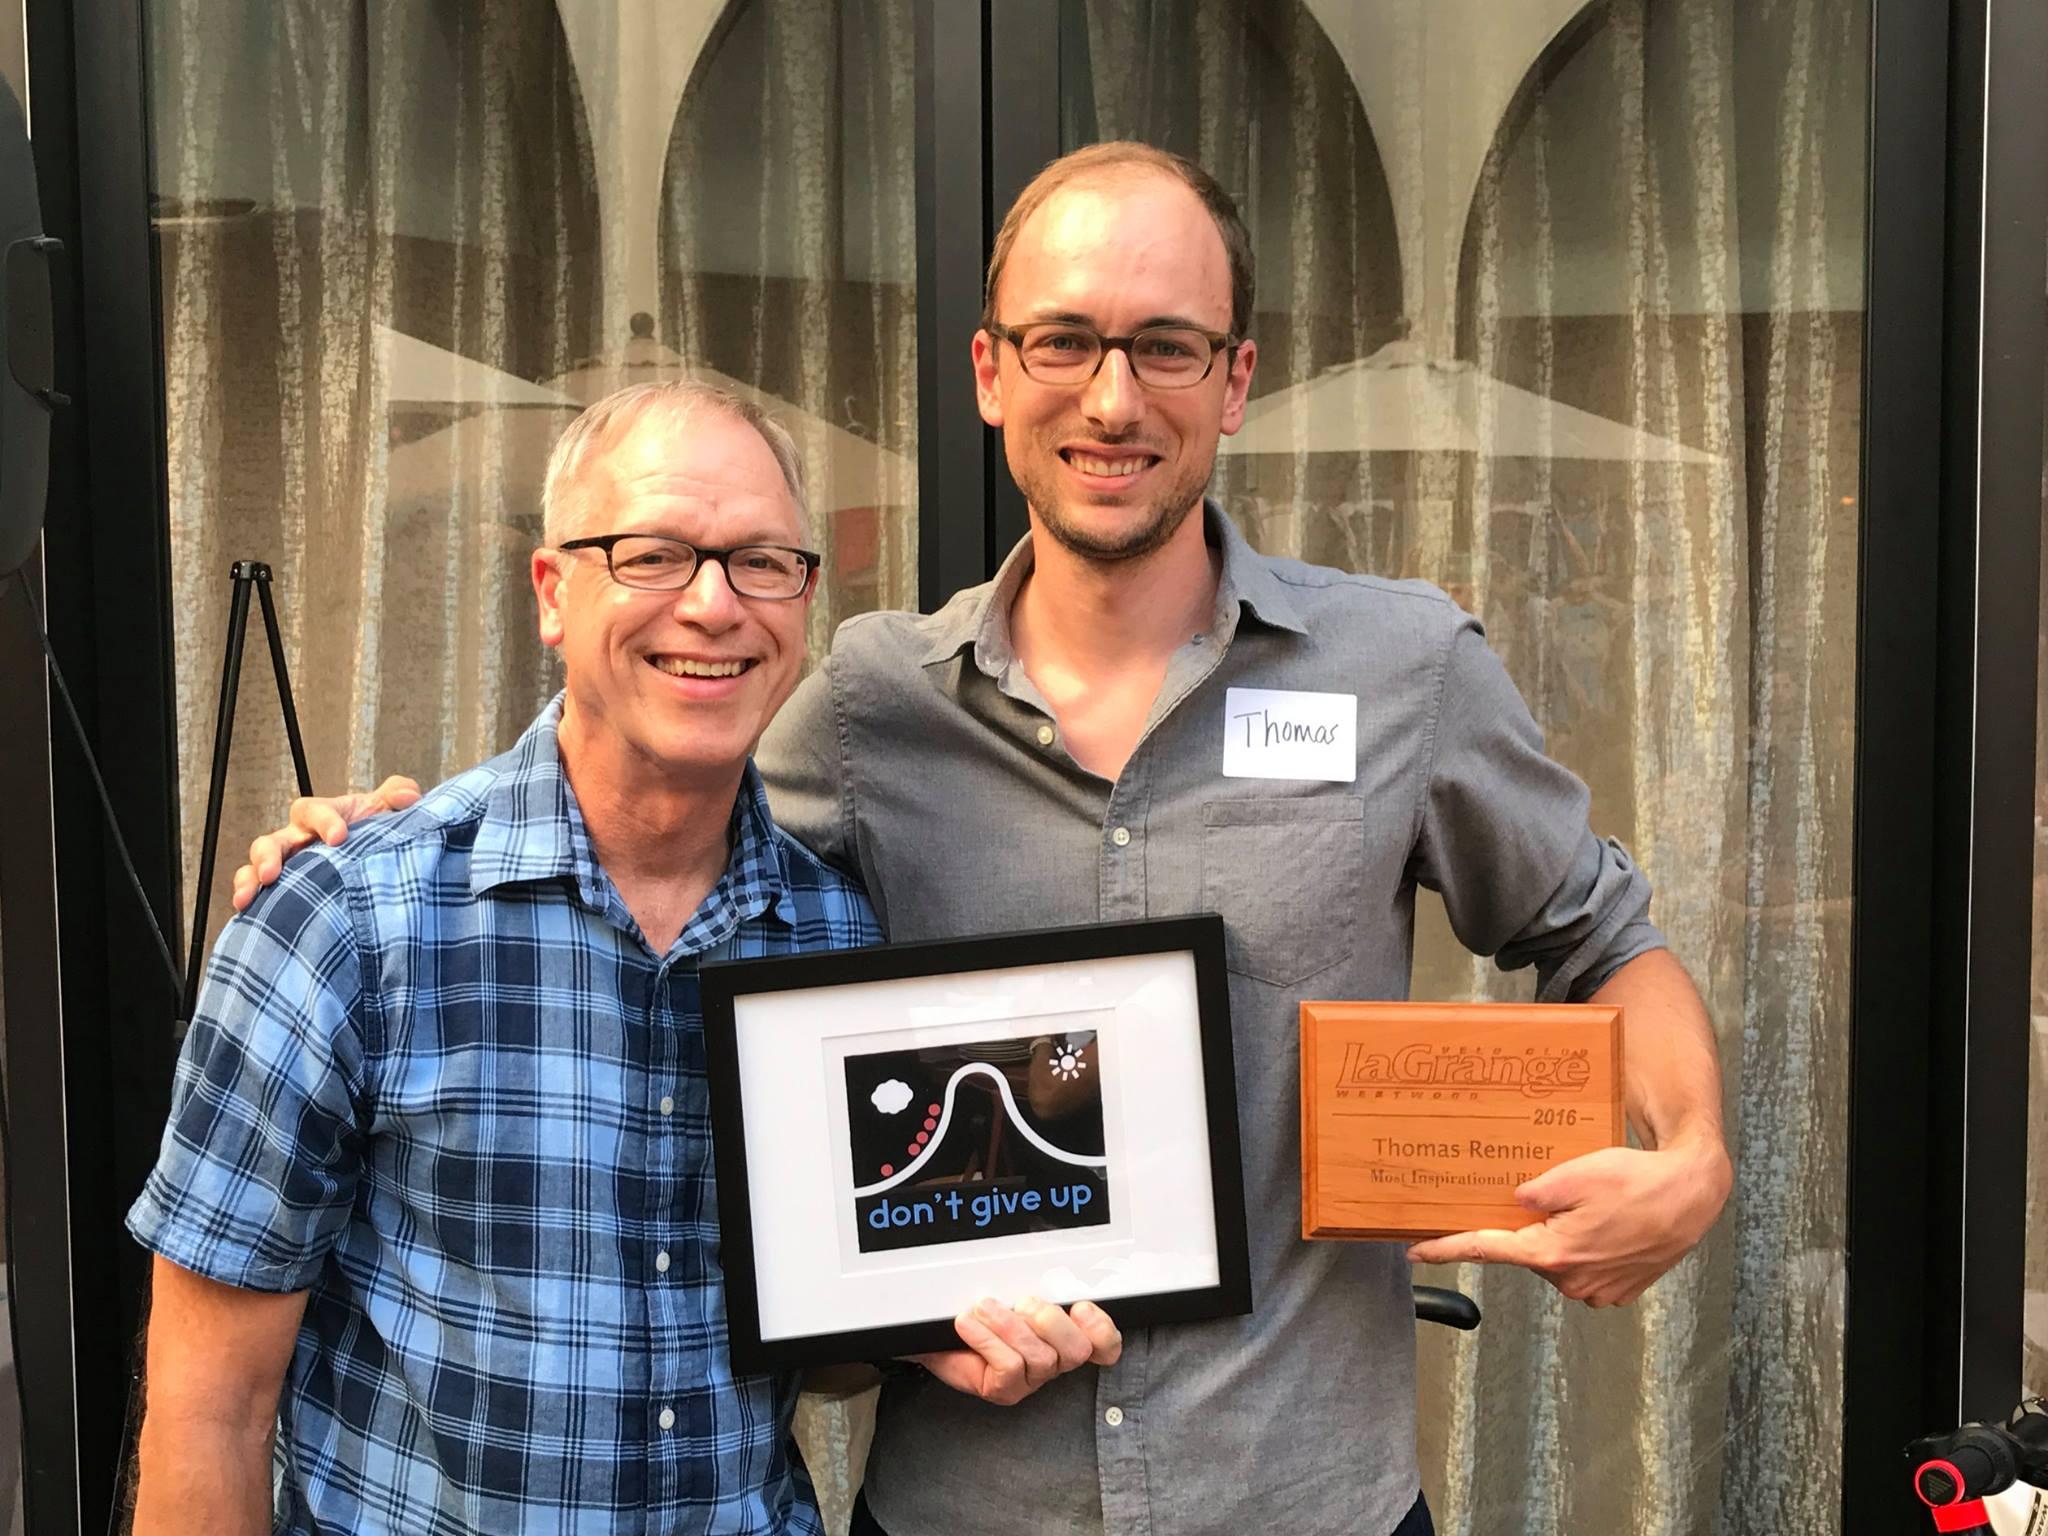 Dan Chapman with Most Inspirational Rider award winner Thomas Rennier.